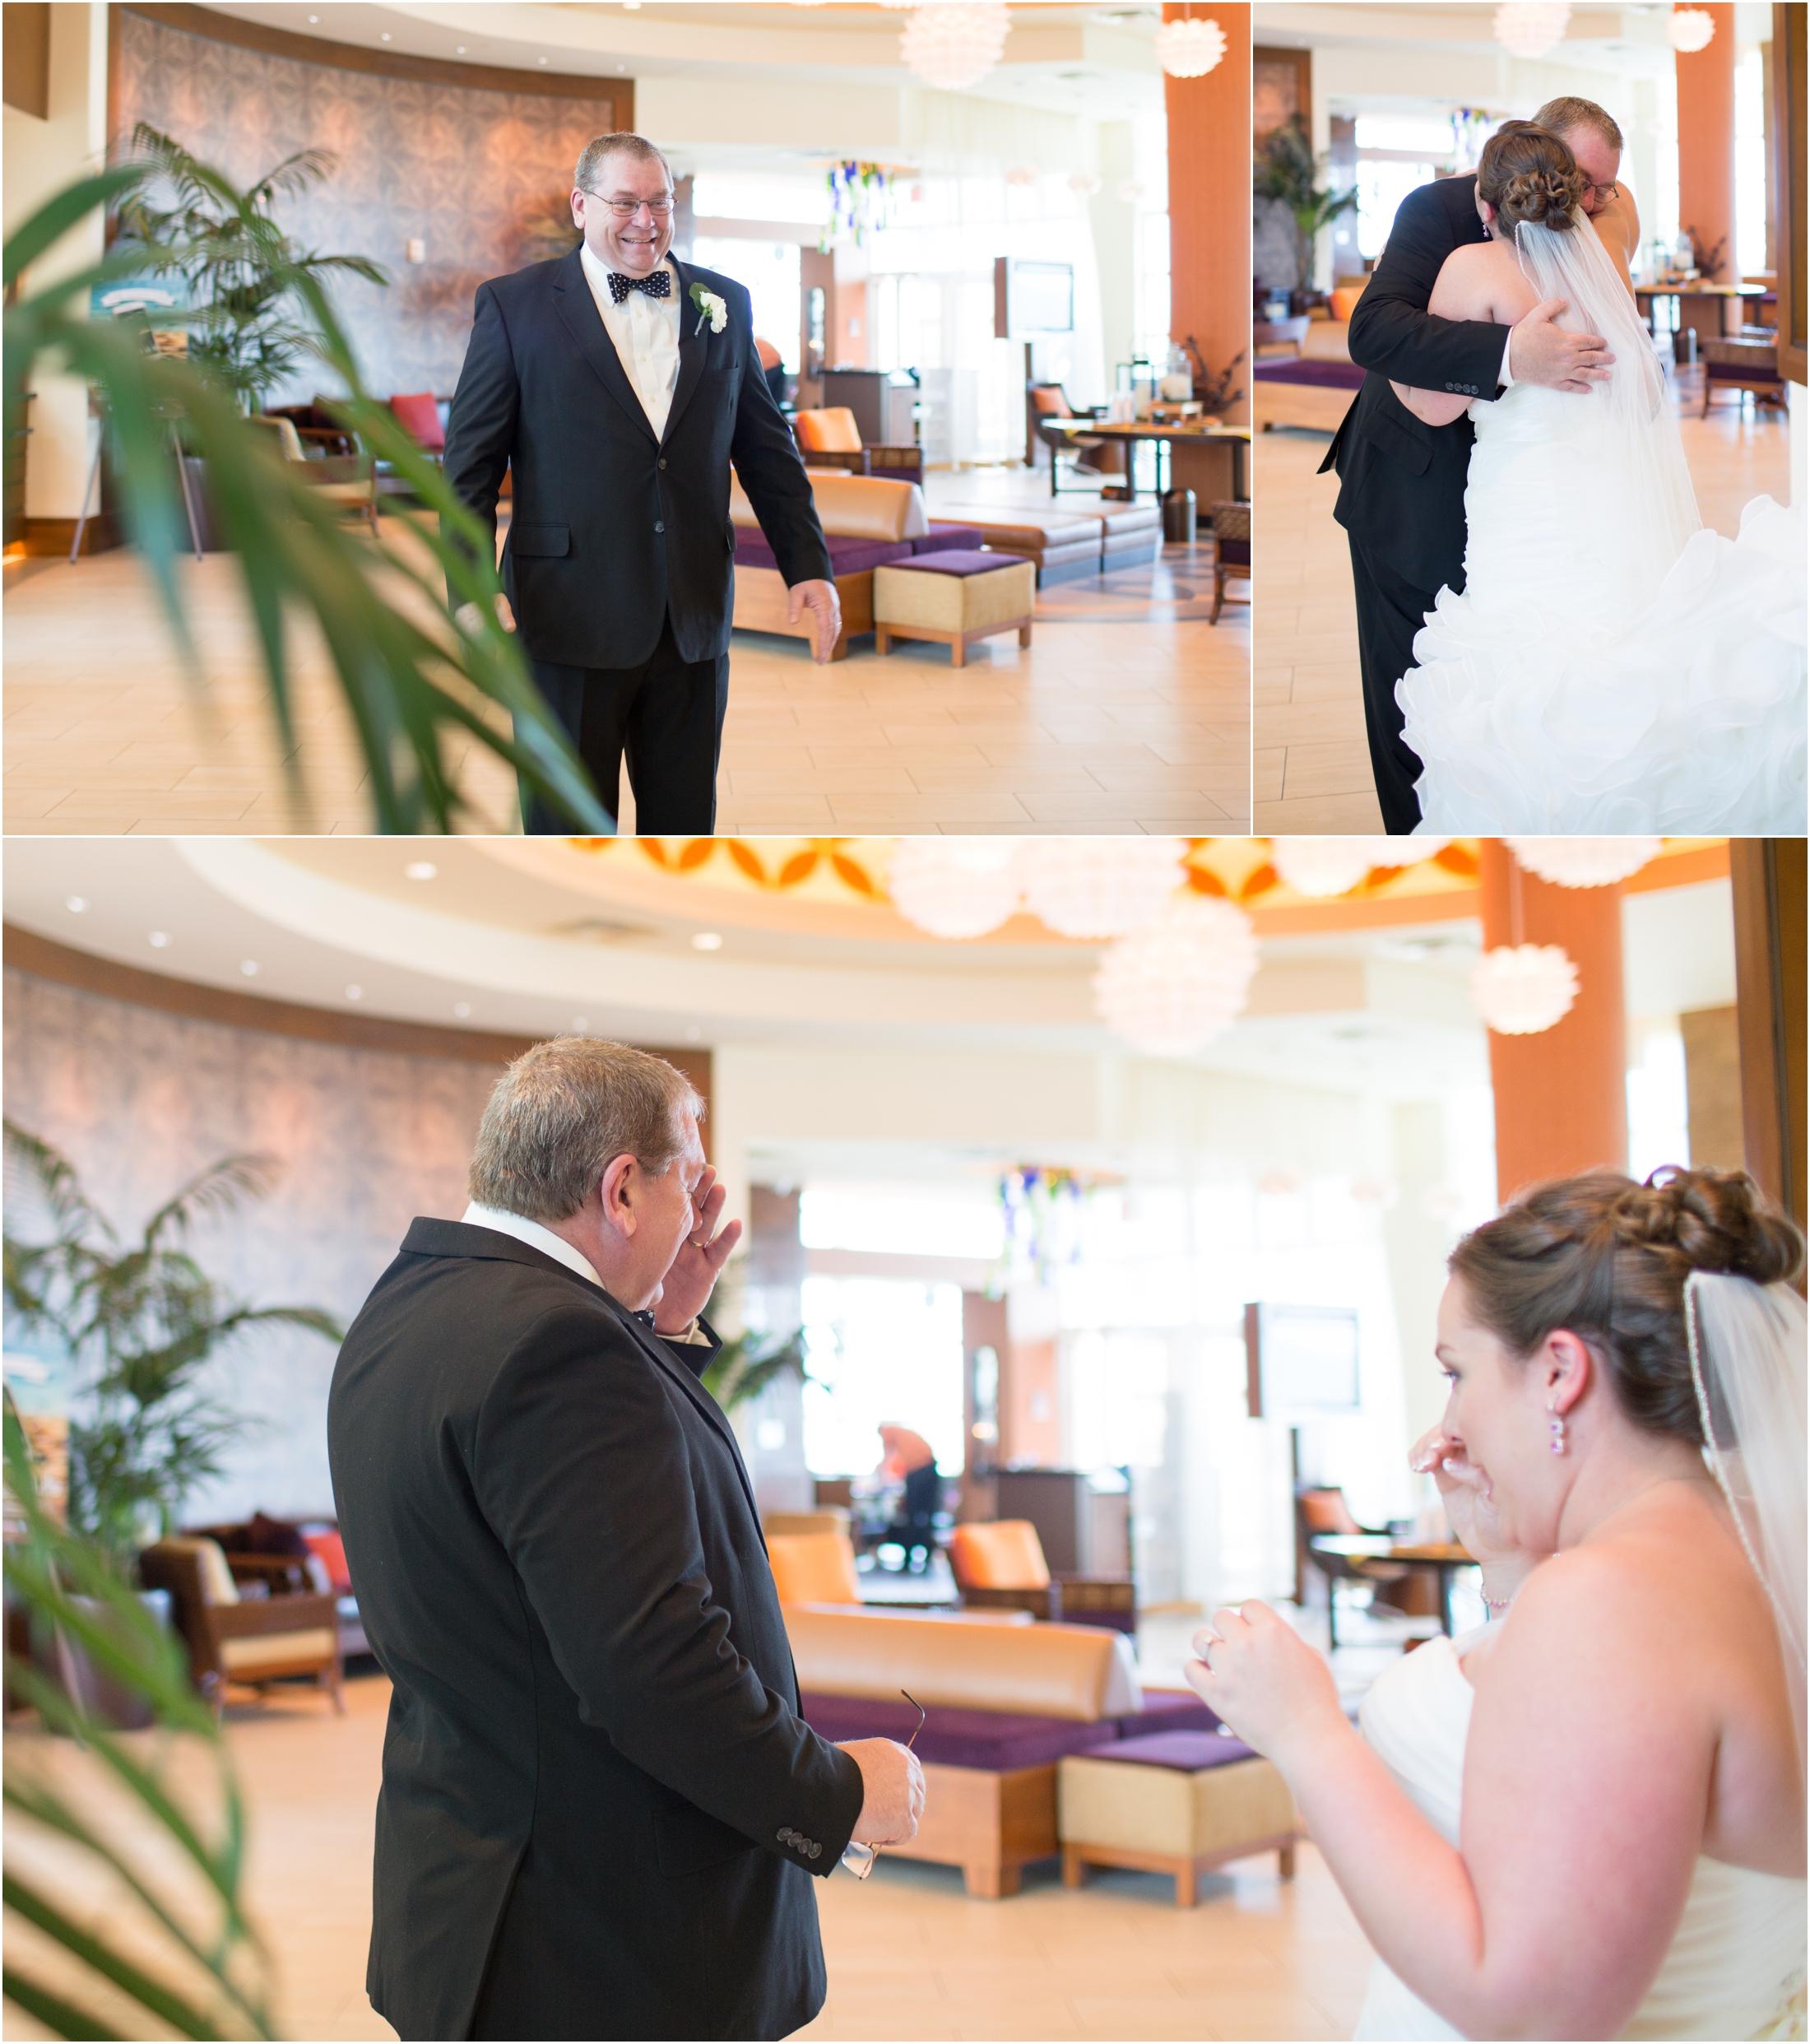 1-Lambert-Wedding-Details-Getting-Ready-665.jpg